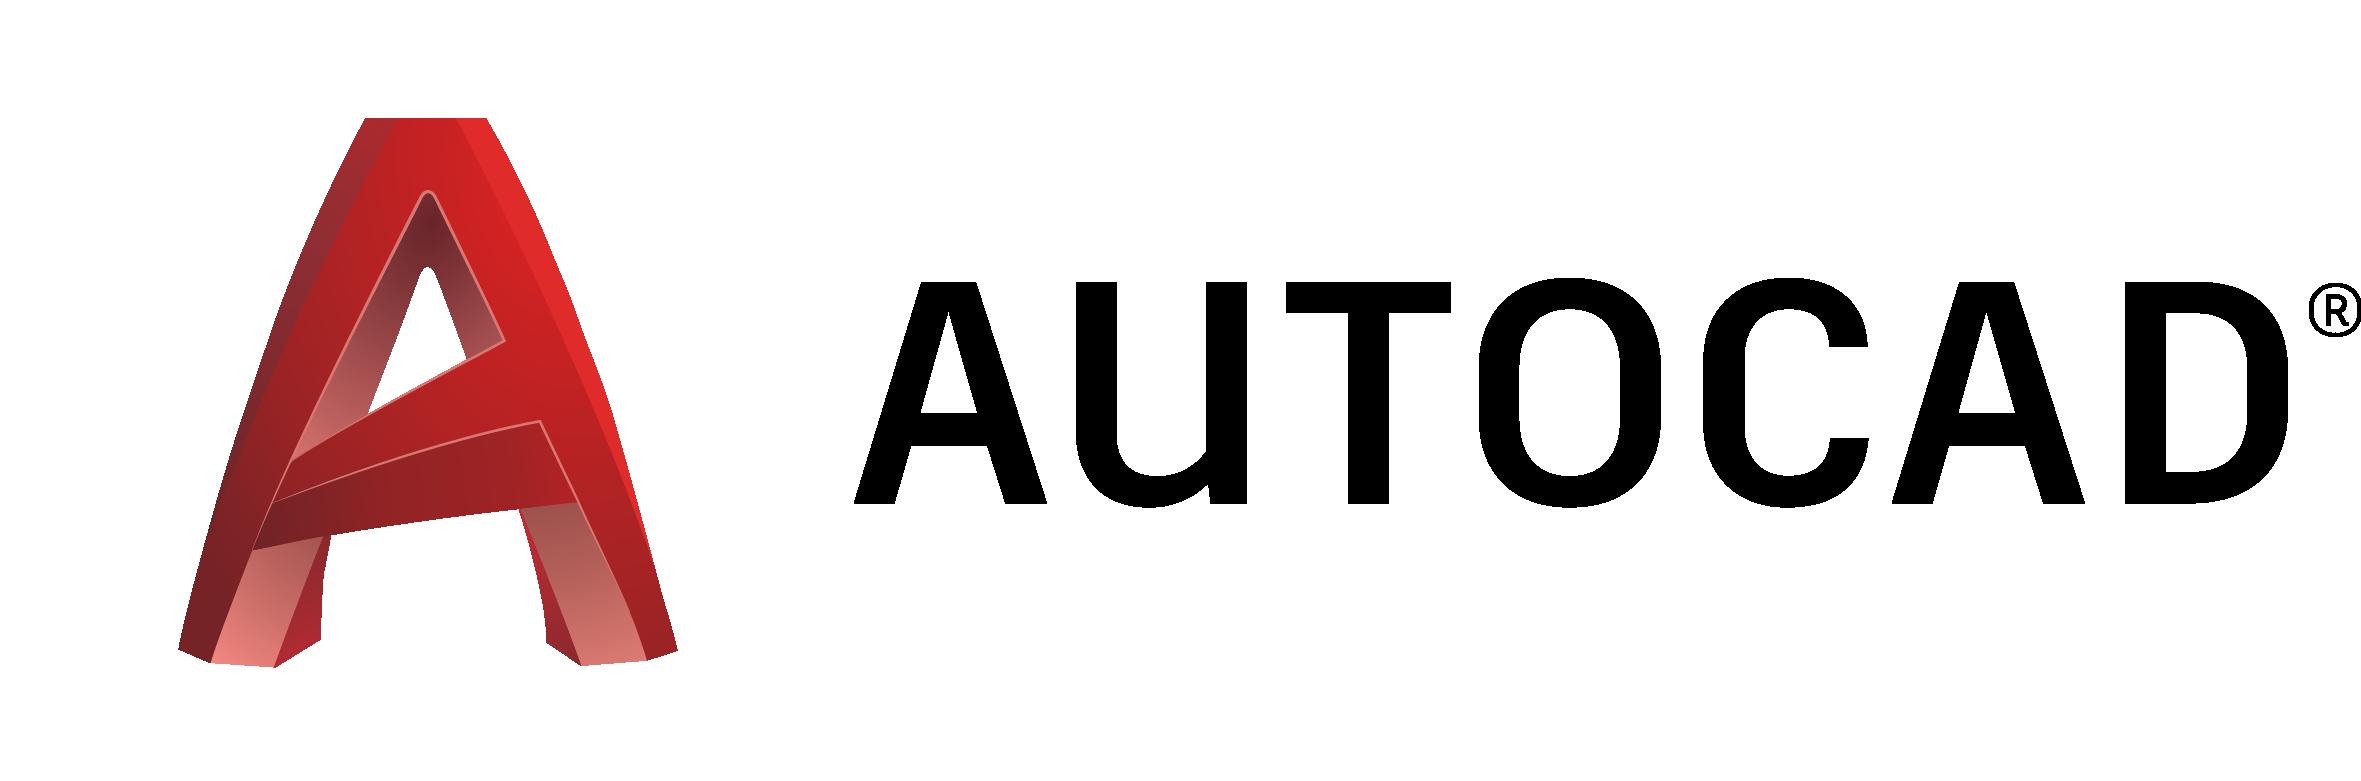 Autocad Logo [Autodesk] Vector EPS Free Download, Logo.